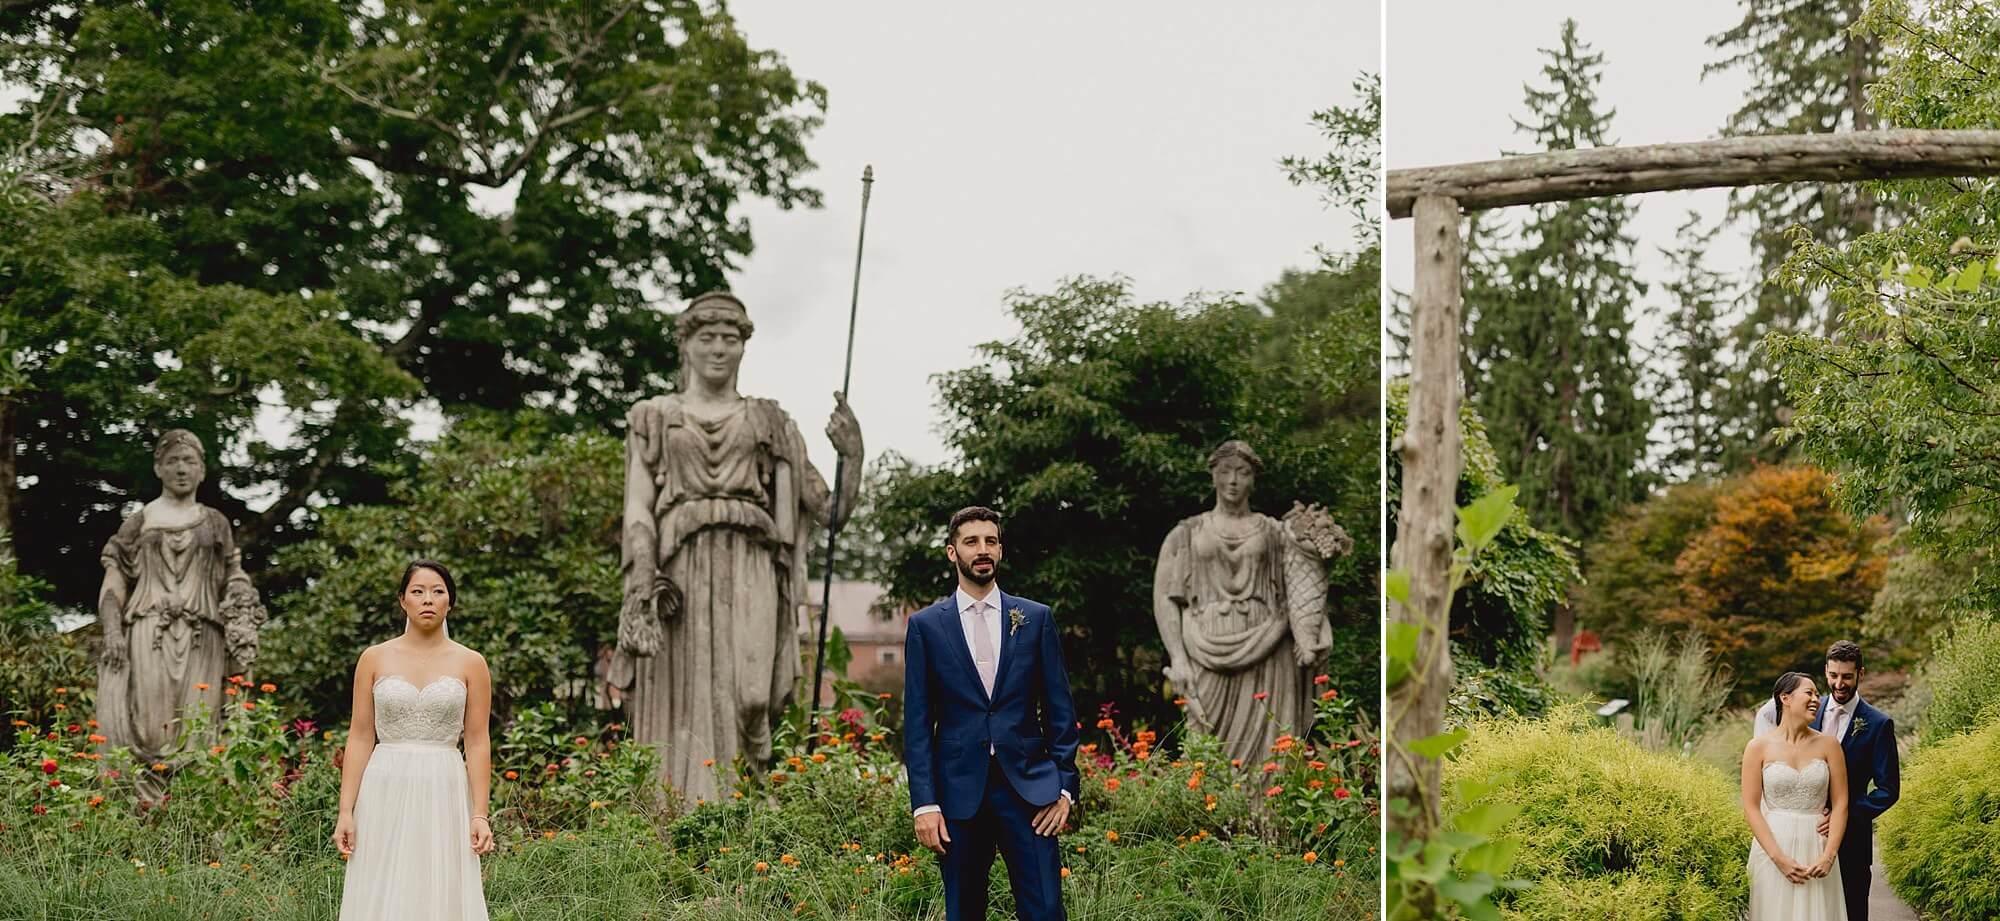 Gardens At Elm Bank Wedding-24.jpg